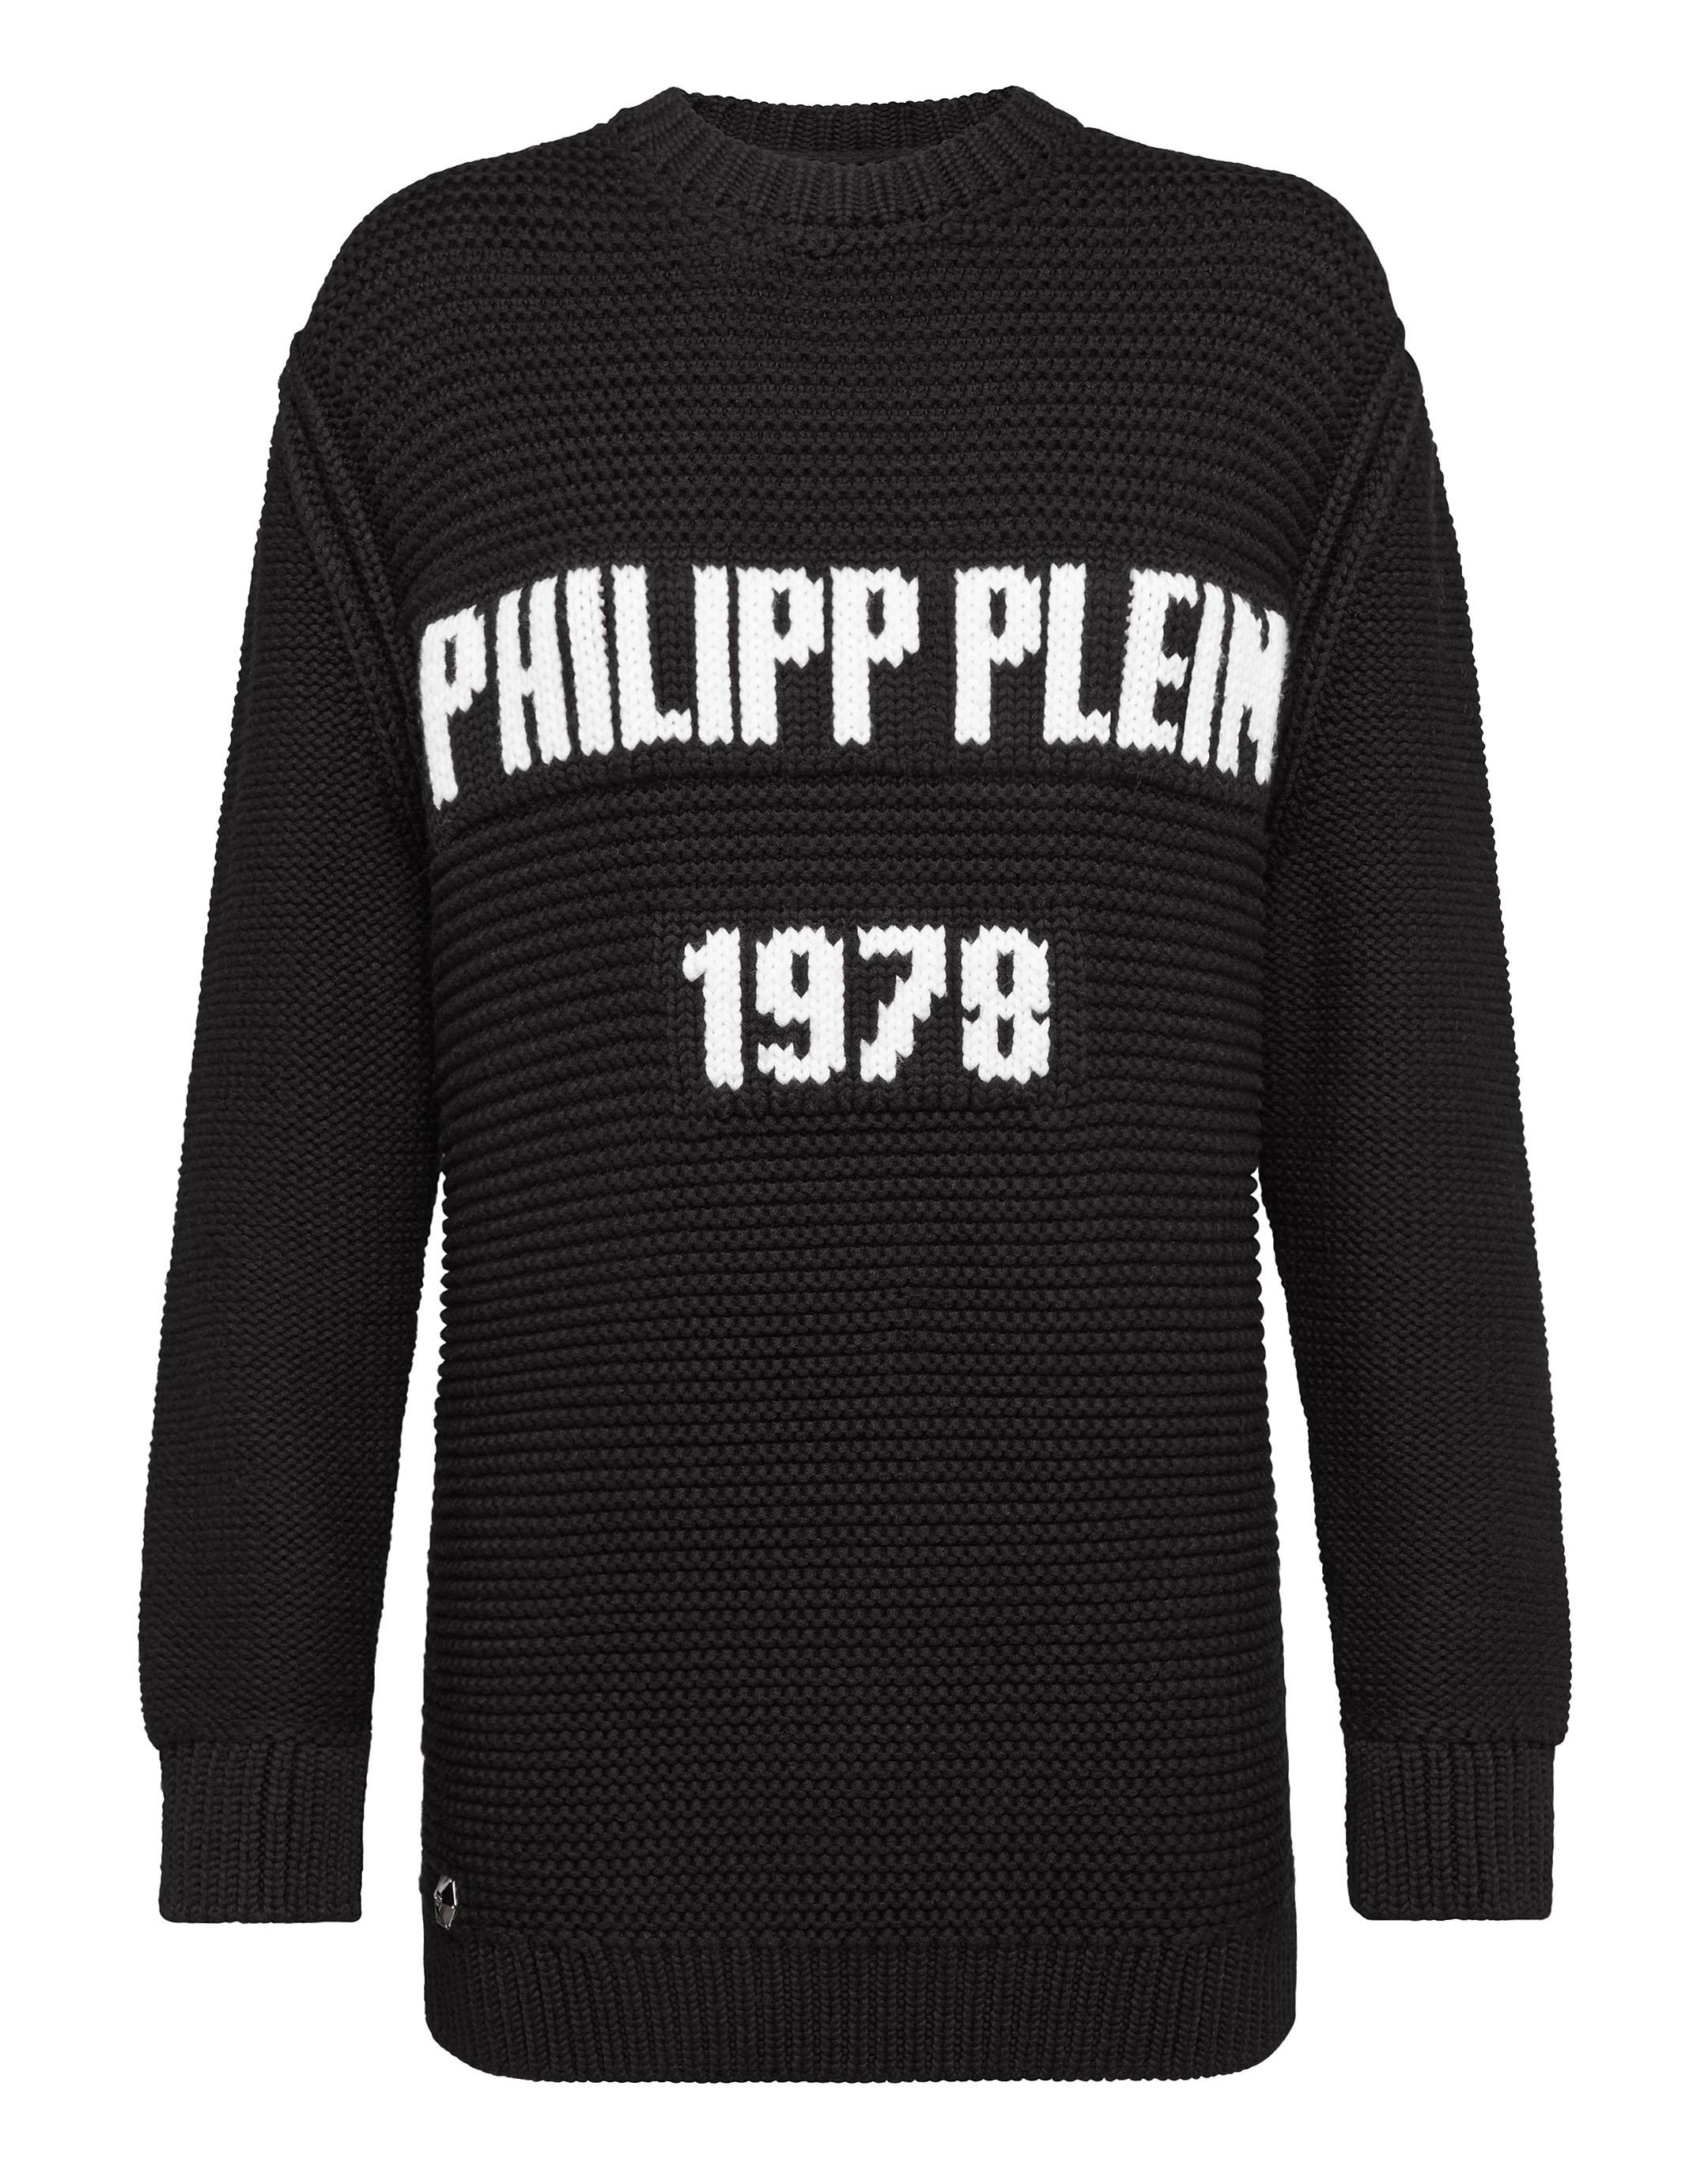 Pullover Round Neck Ls Pp1978 in Basic from PHILIPP PLEIN